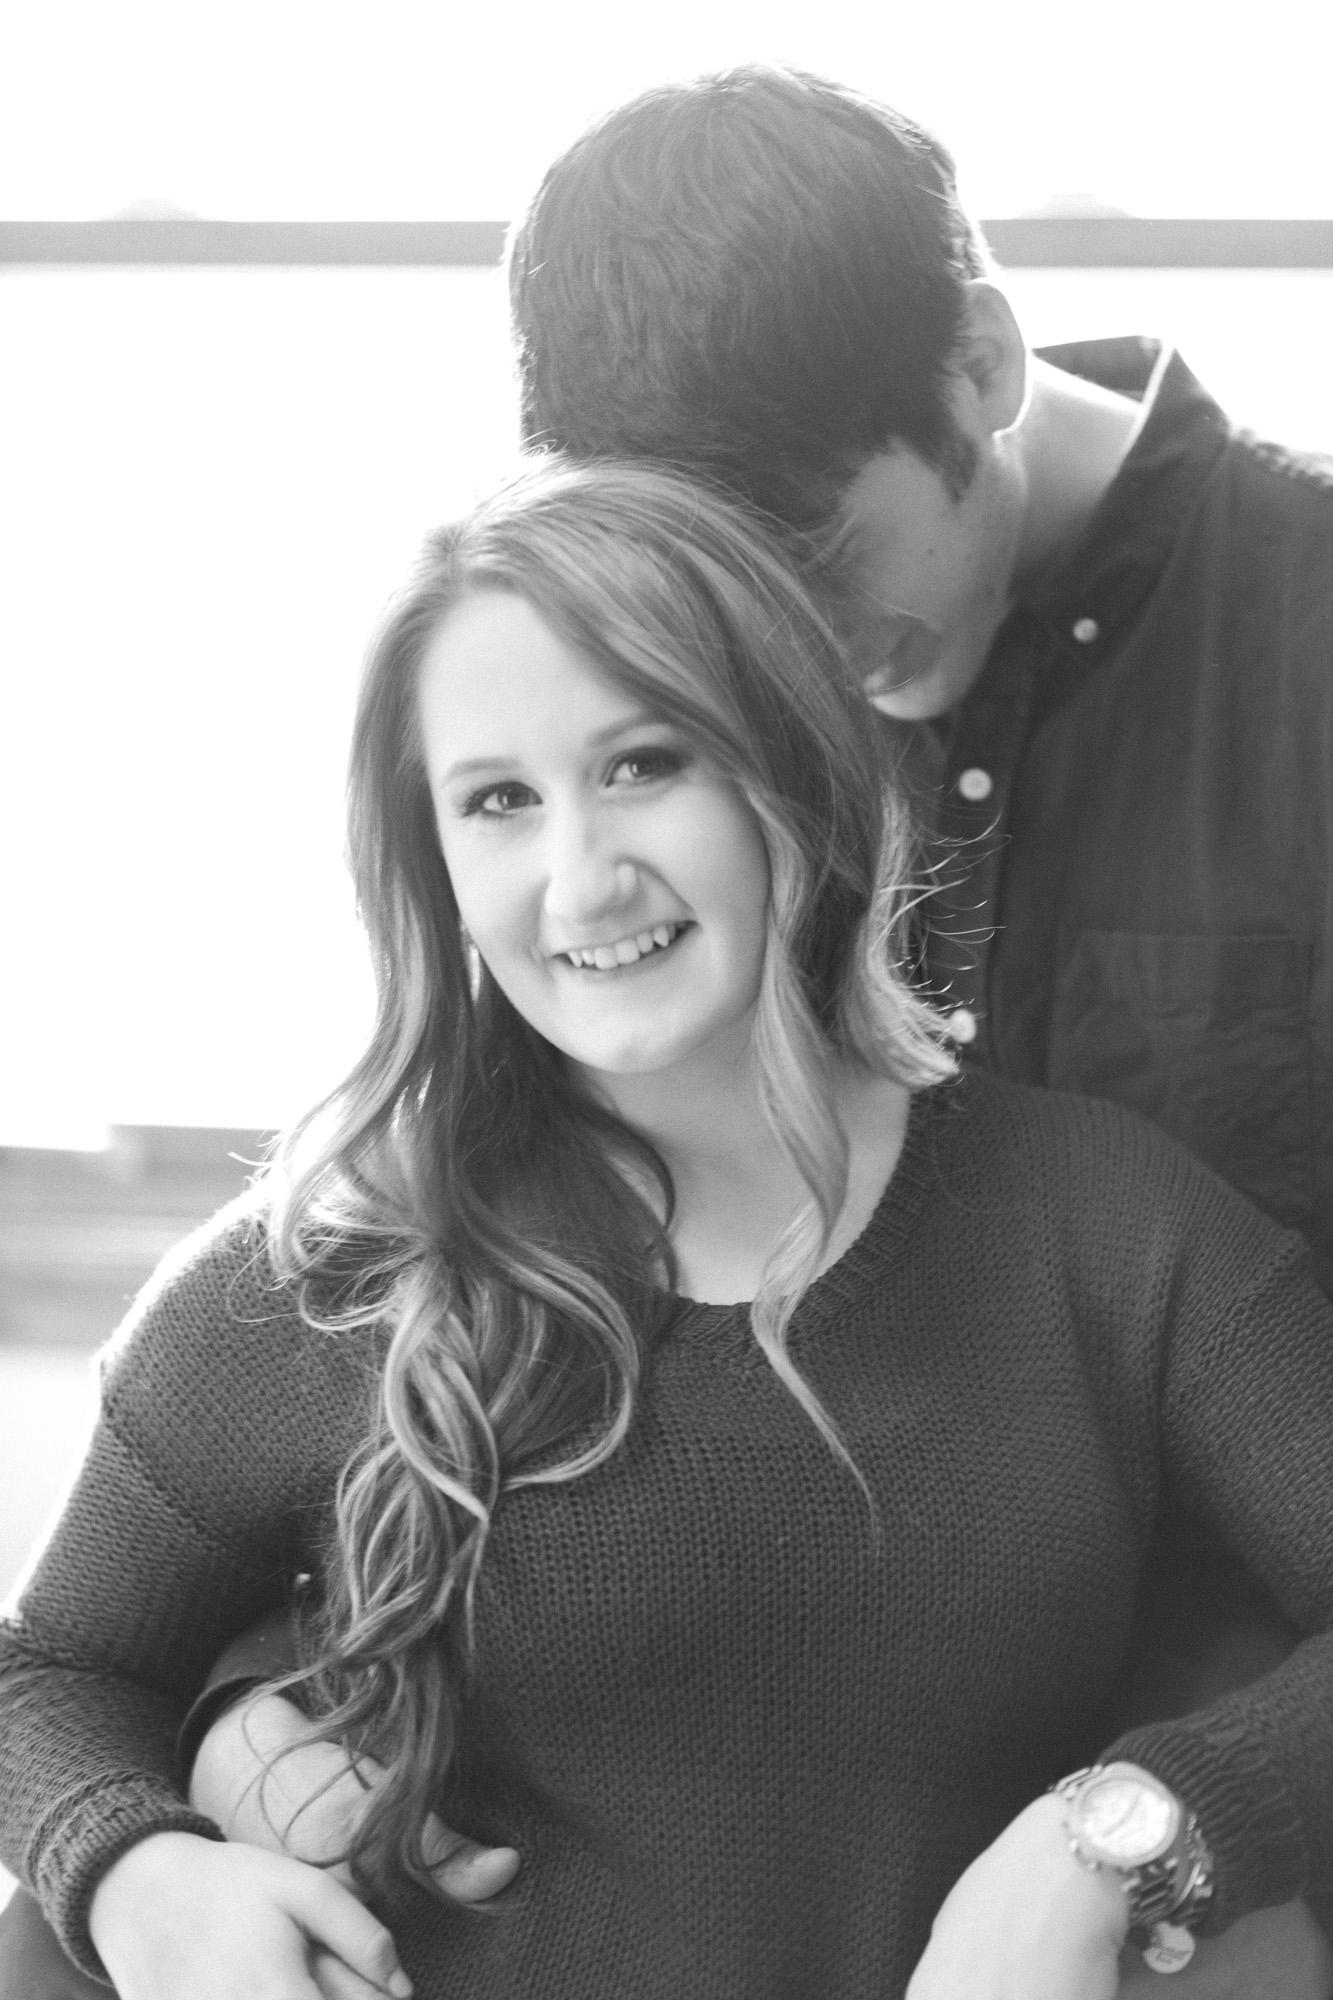 Lifestyle Engagement Photos in Wooster, Ohio by Cleveland Wedding Photographer Matt Erickson Photography